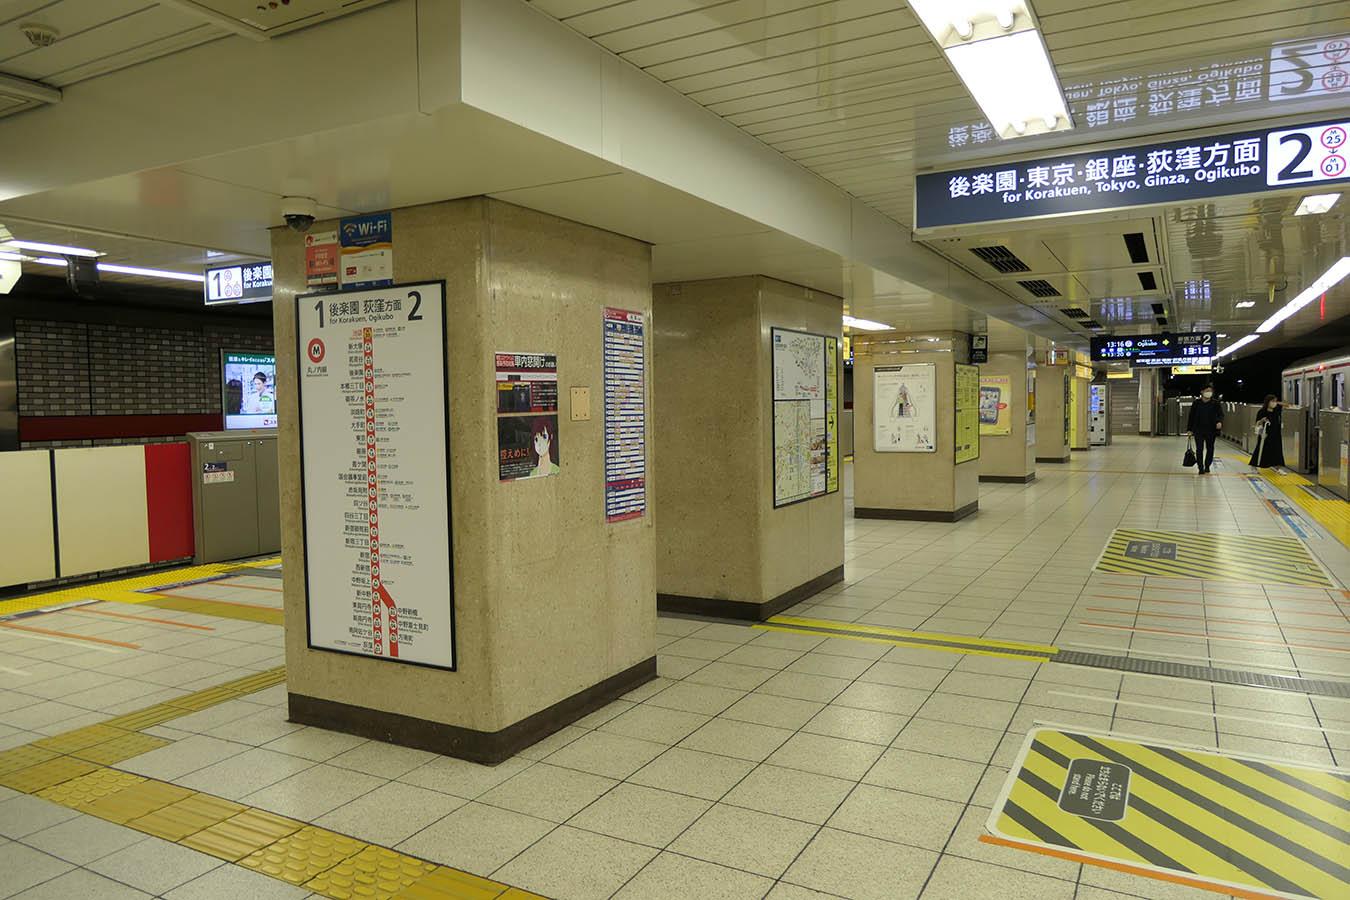 M25_photo02.jpg